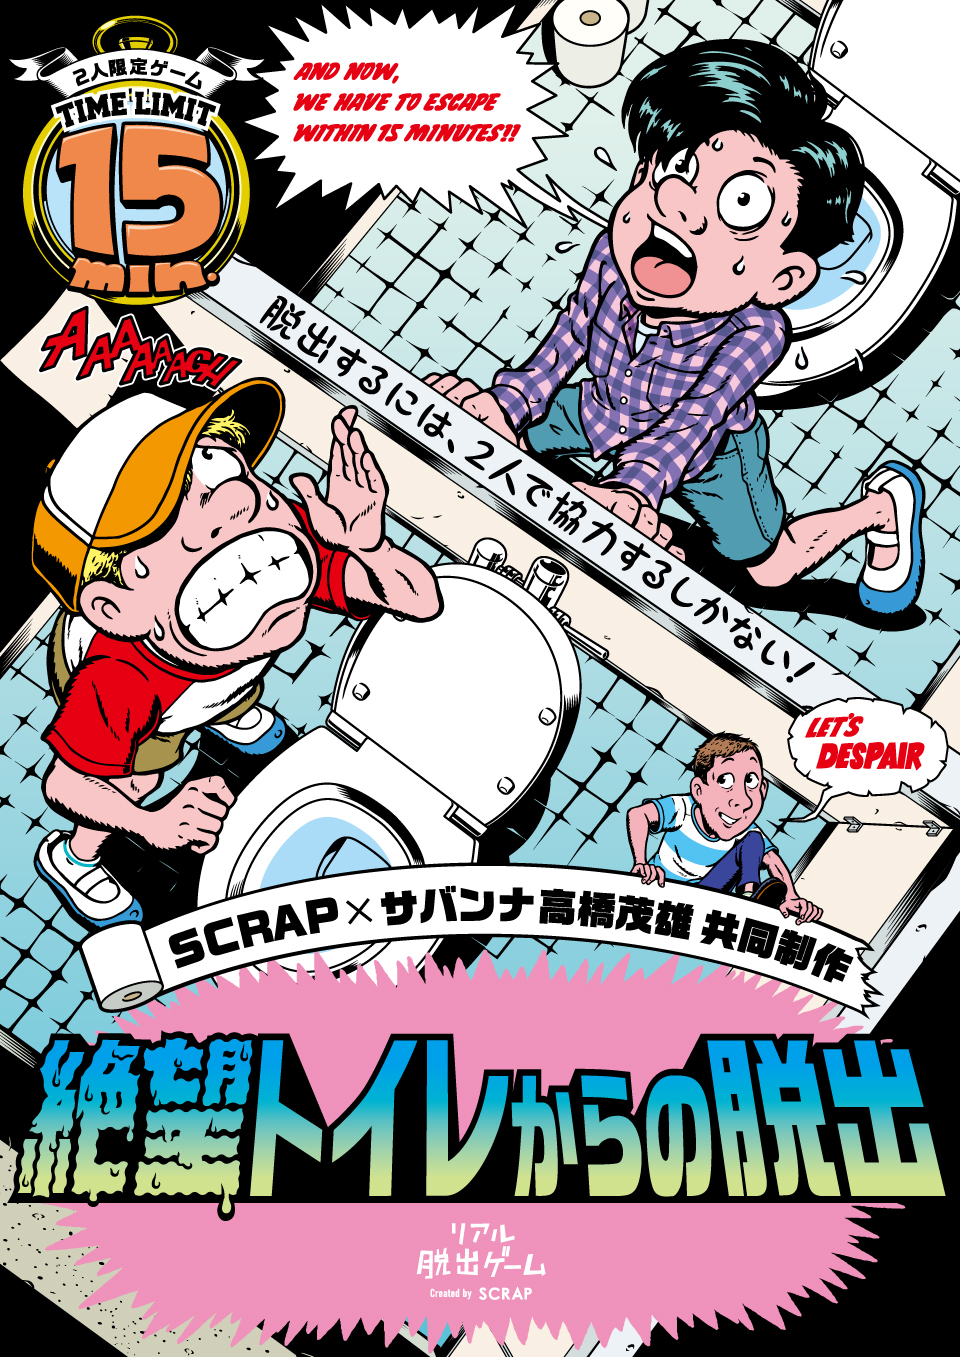 SCRAP×サバンナ高橋茂雄 共同制作「絶望トイレからの脱出」